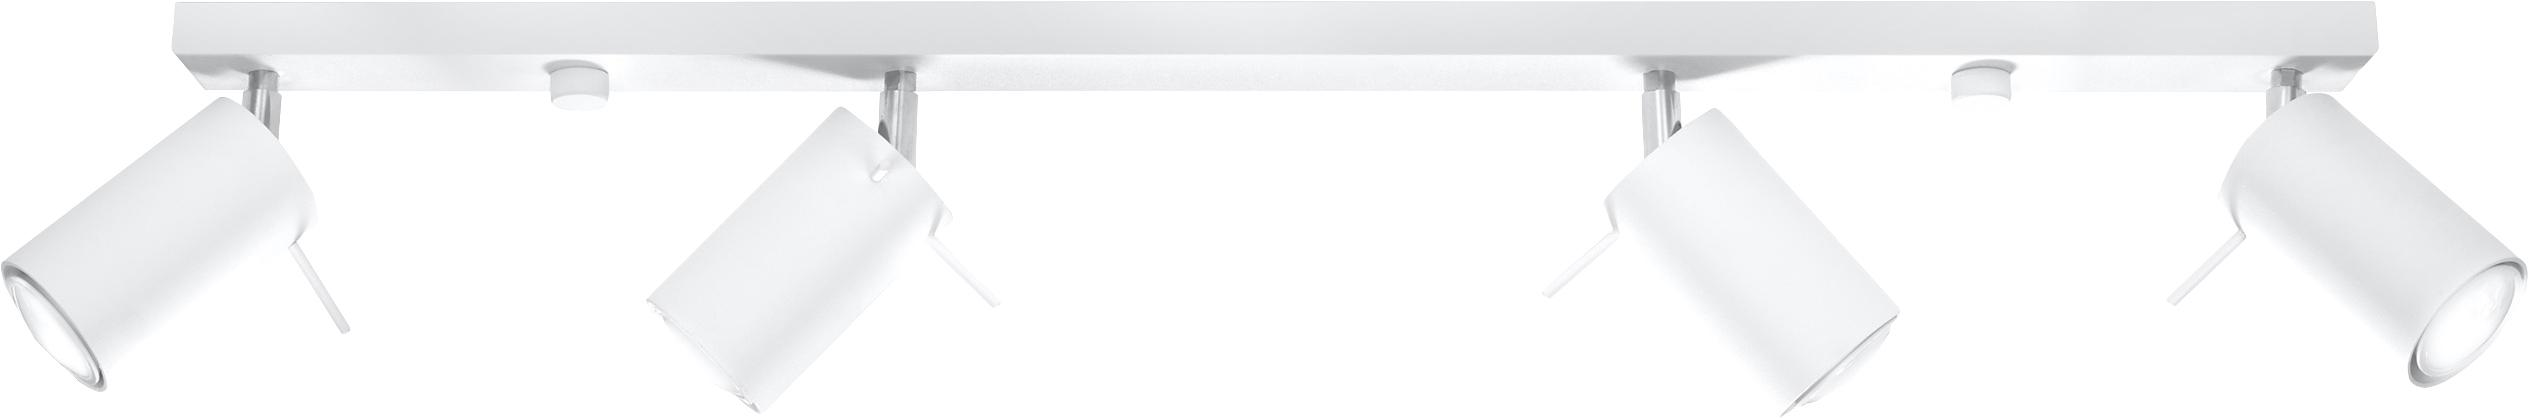 Faretti da soffitto bianchi Etna, Acciaio verniciato, Bianco, Larg. 81 x Alt. 16 cm